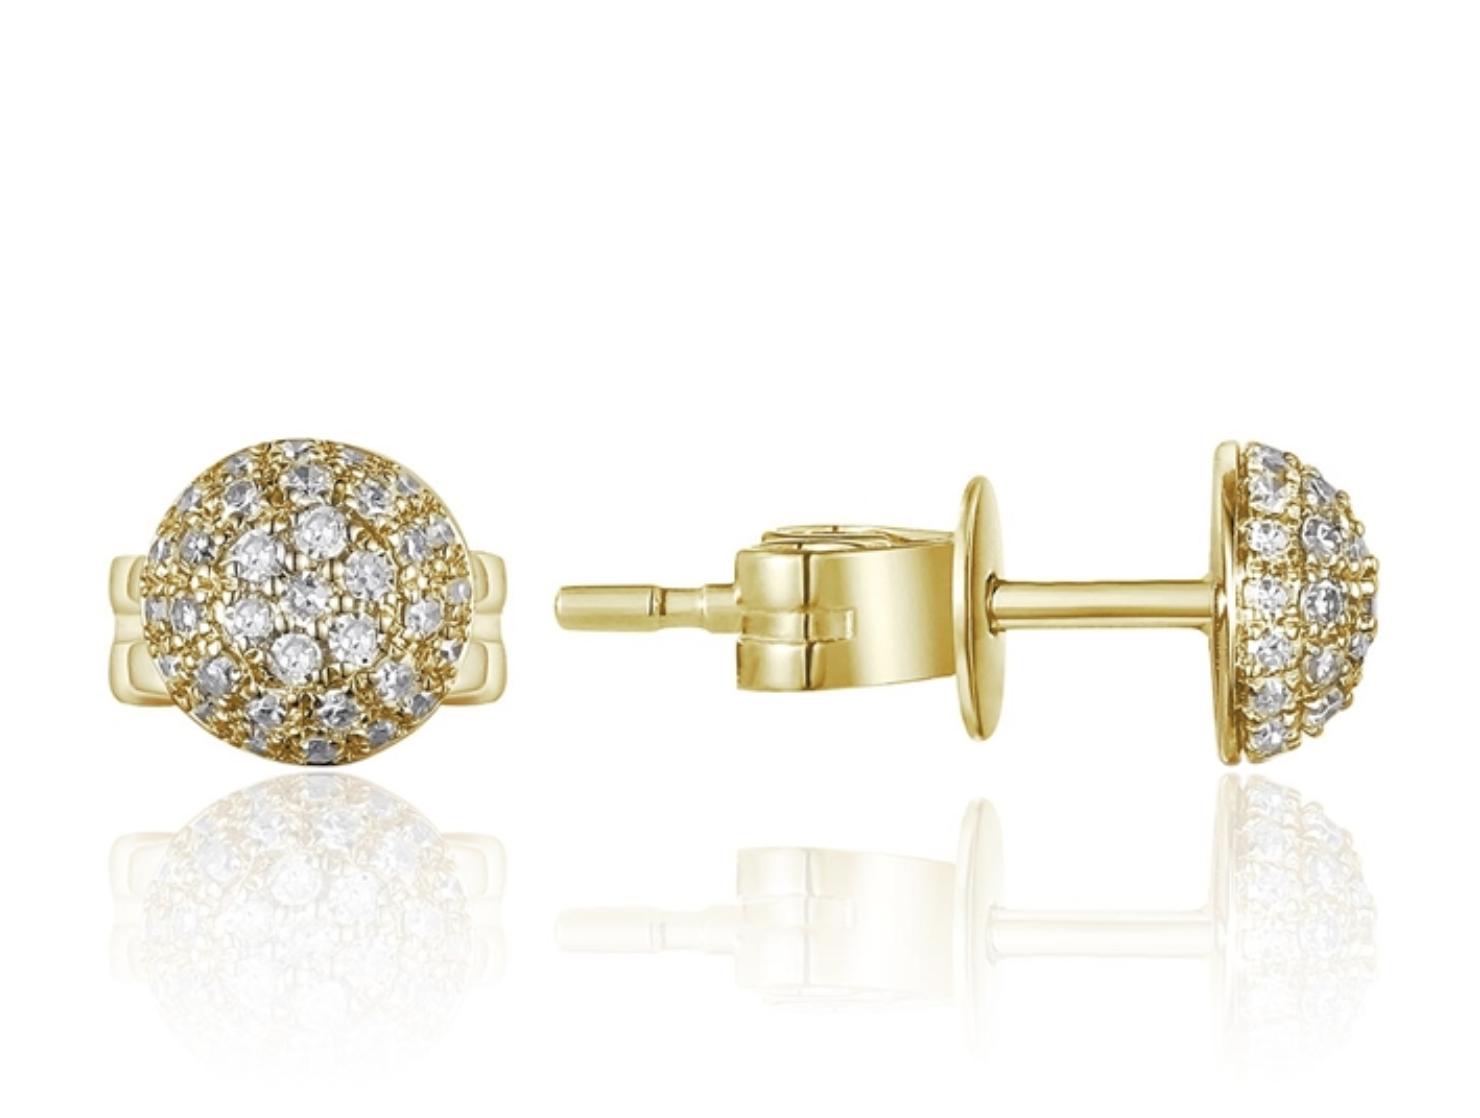 Luvente Small Pave Diamond Dome Stud Earrings LV100